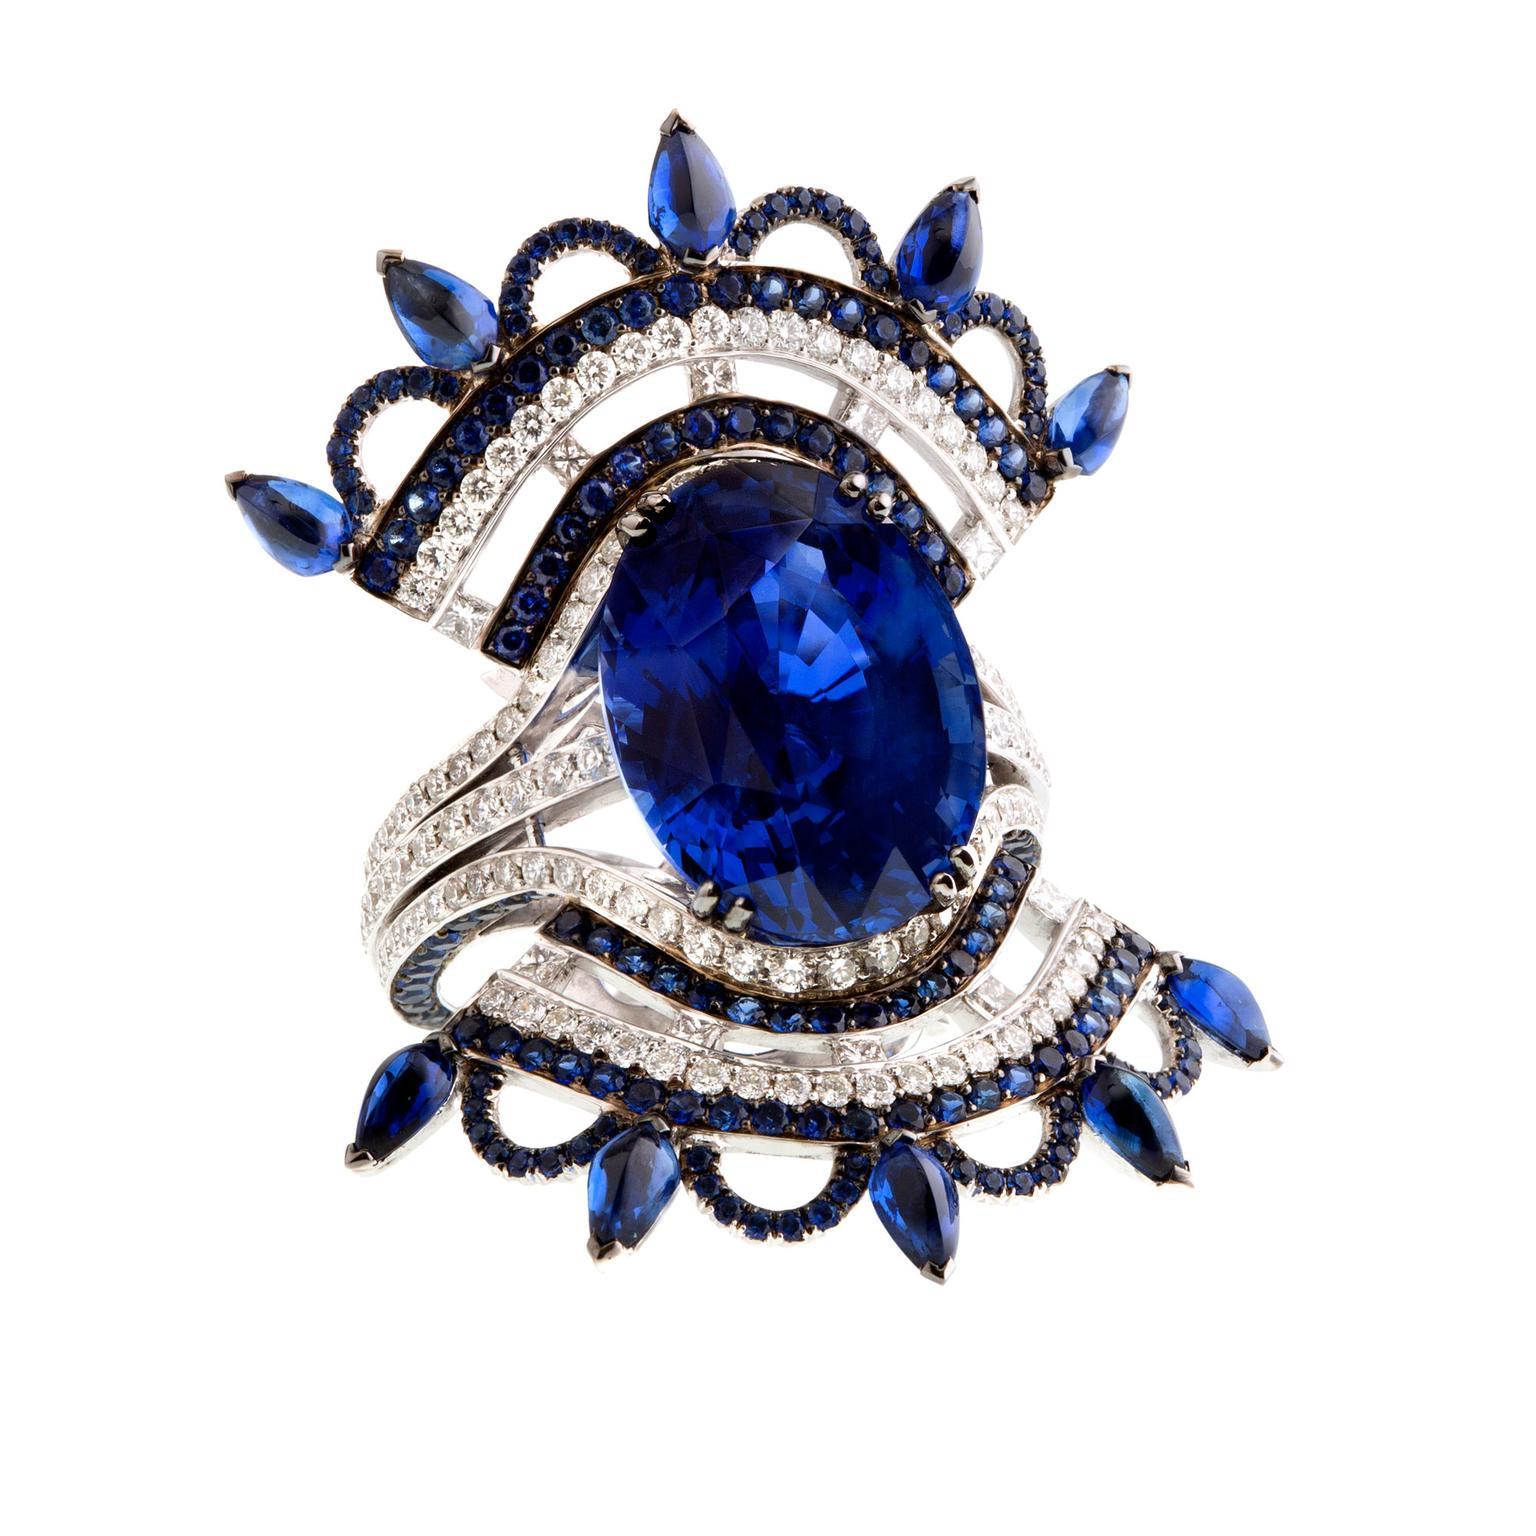 John Rubel Jewellery Dances Back Into